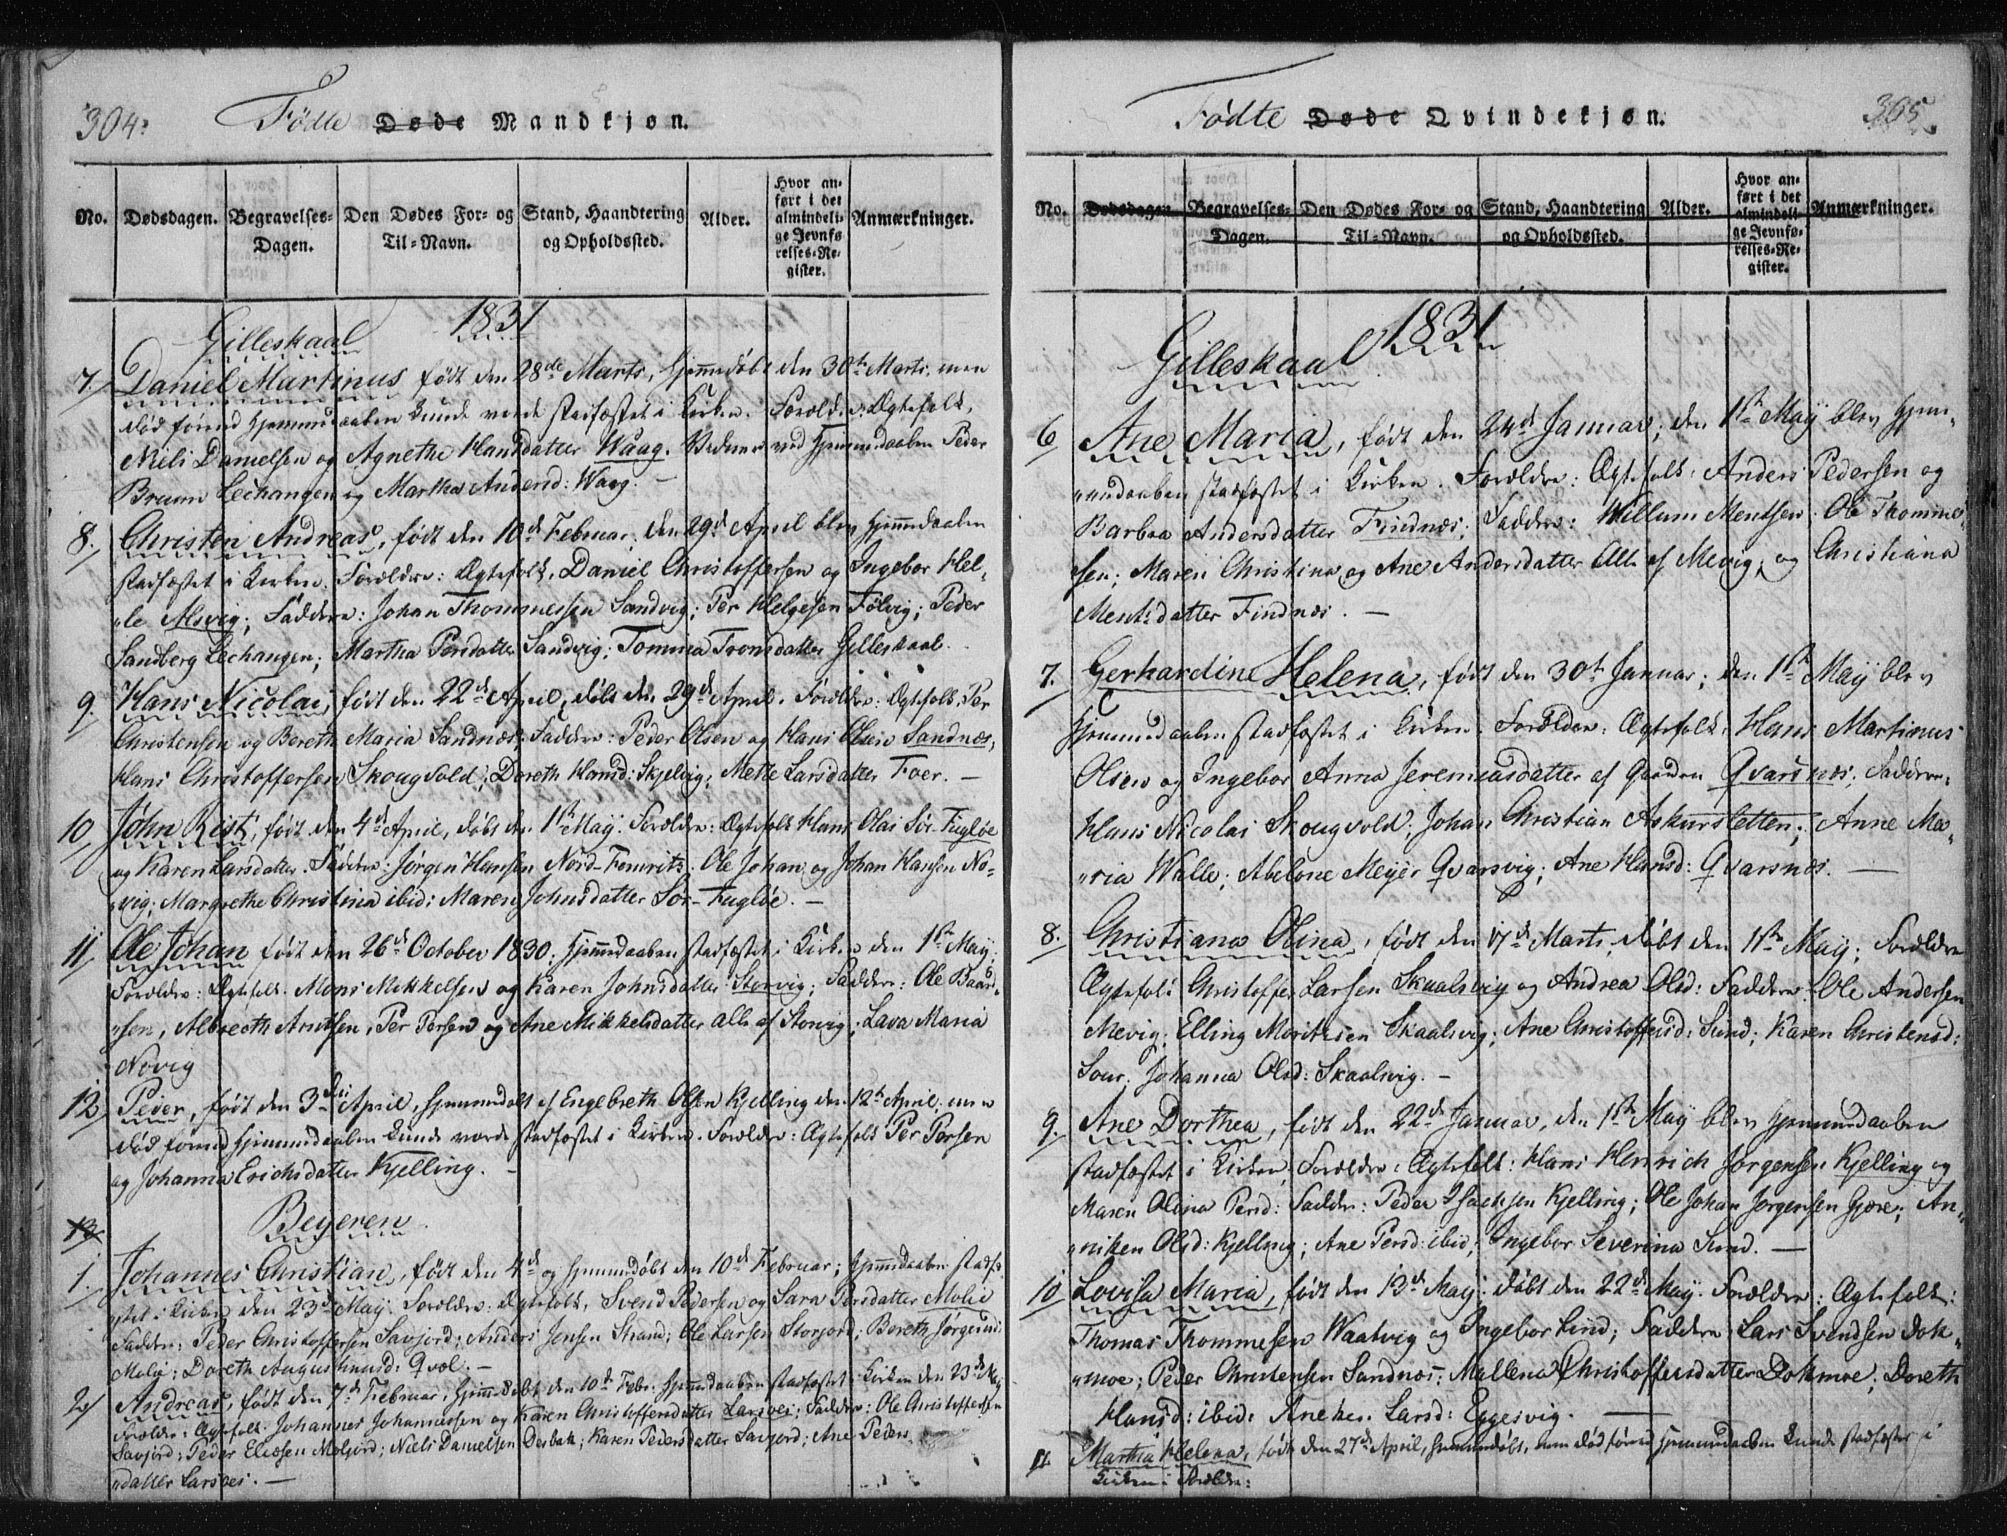 SAT, Ministerialprotokoller, klokkerbøker og fødselsregistre - Nordland, 805/L0096: Ministerialbok nr. 805A03, 1820-1837, s. 304-305